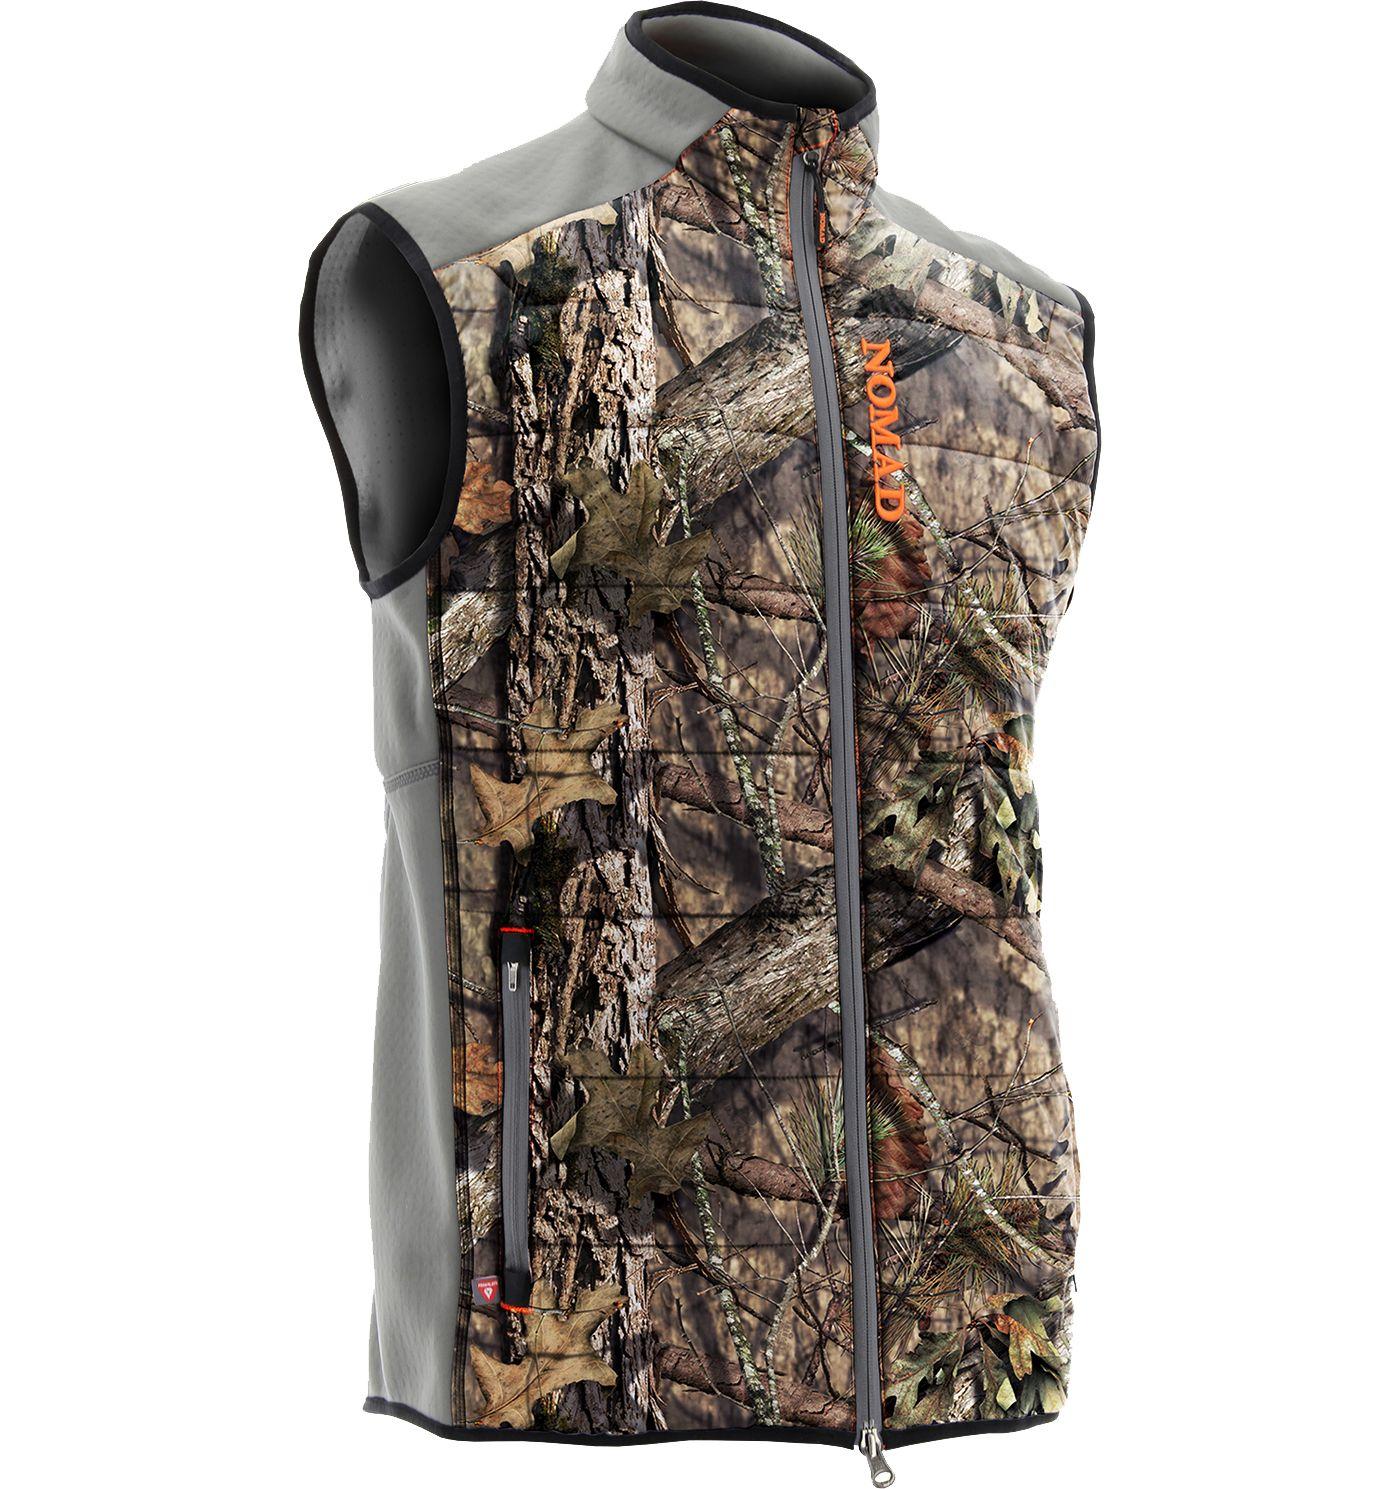 NOMAD Dunn Hunting Vest